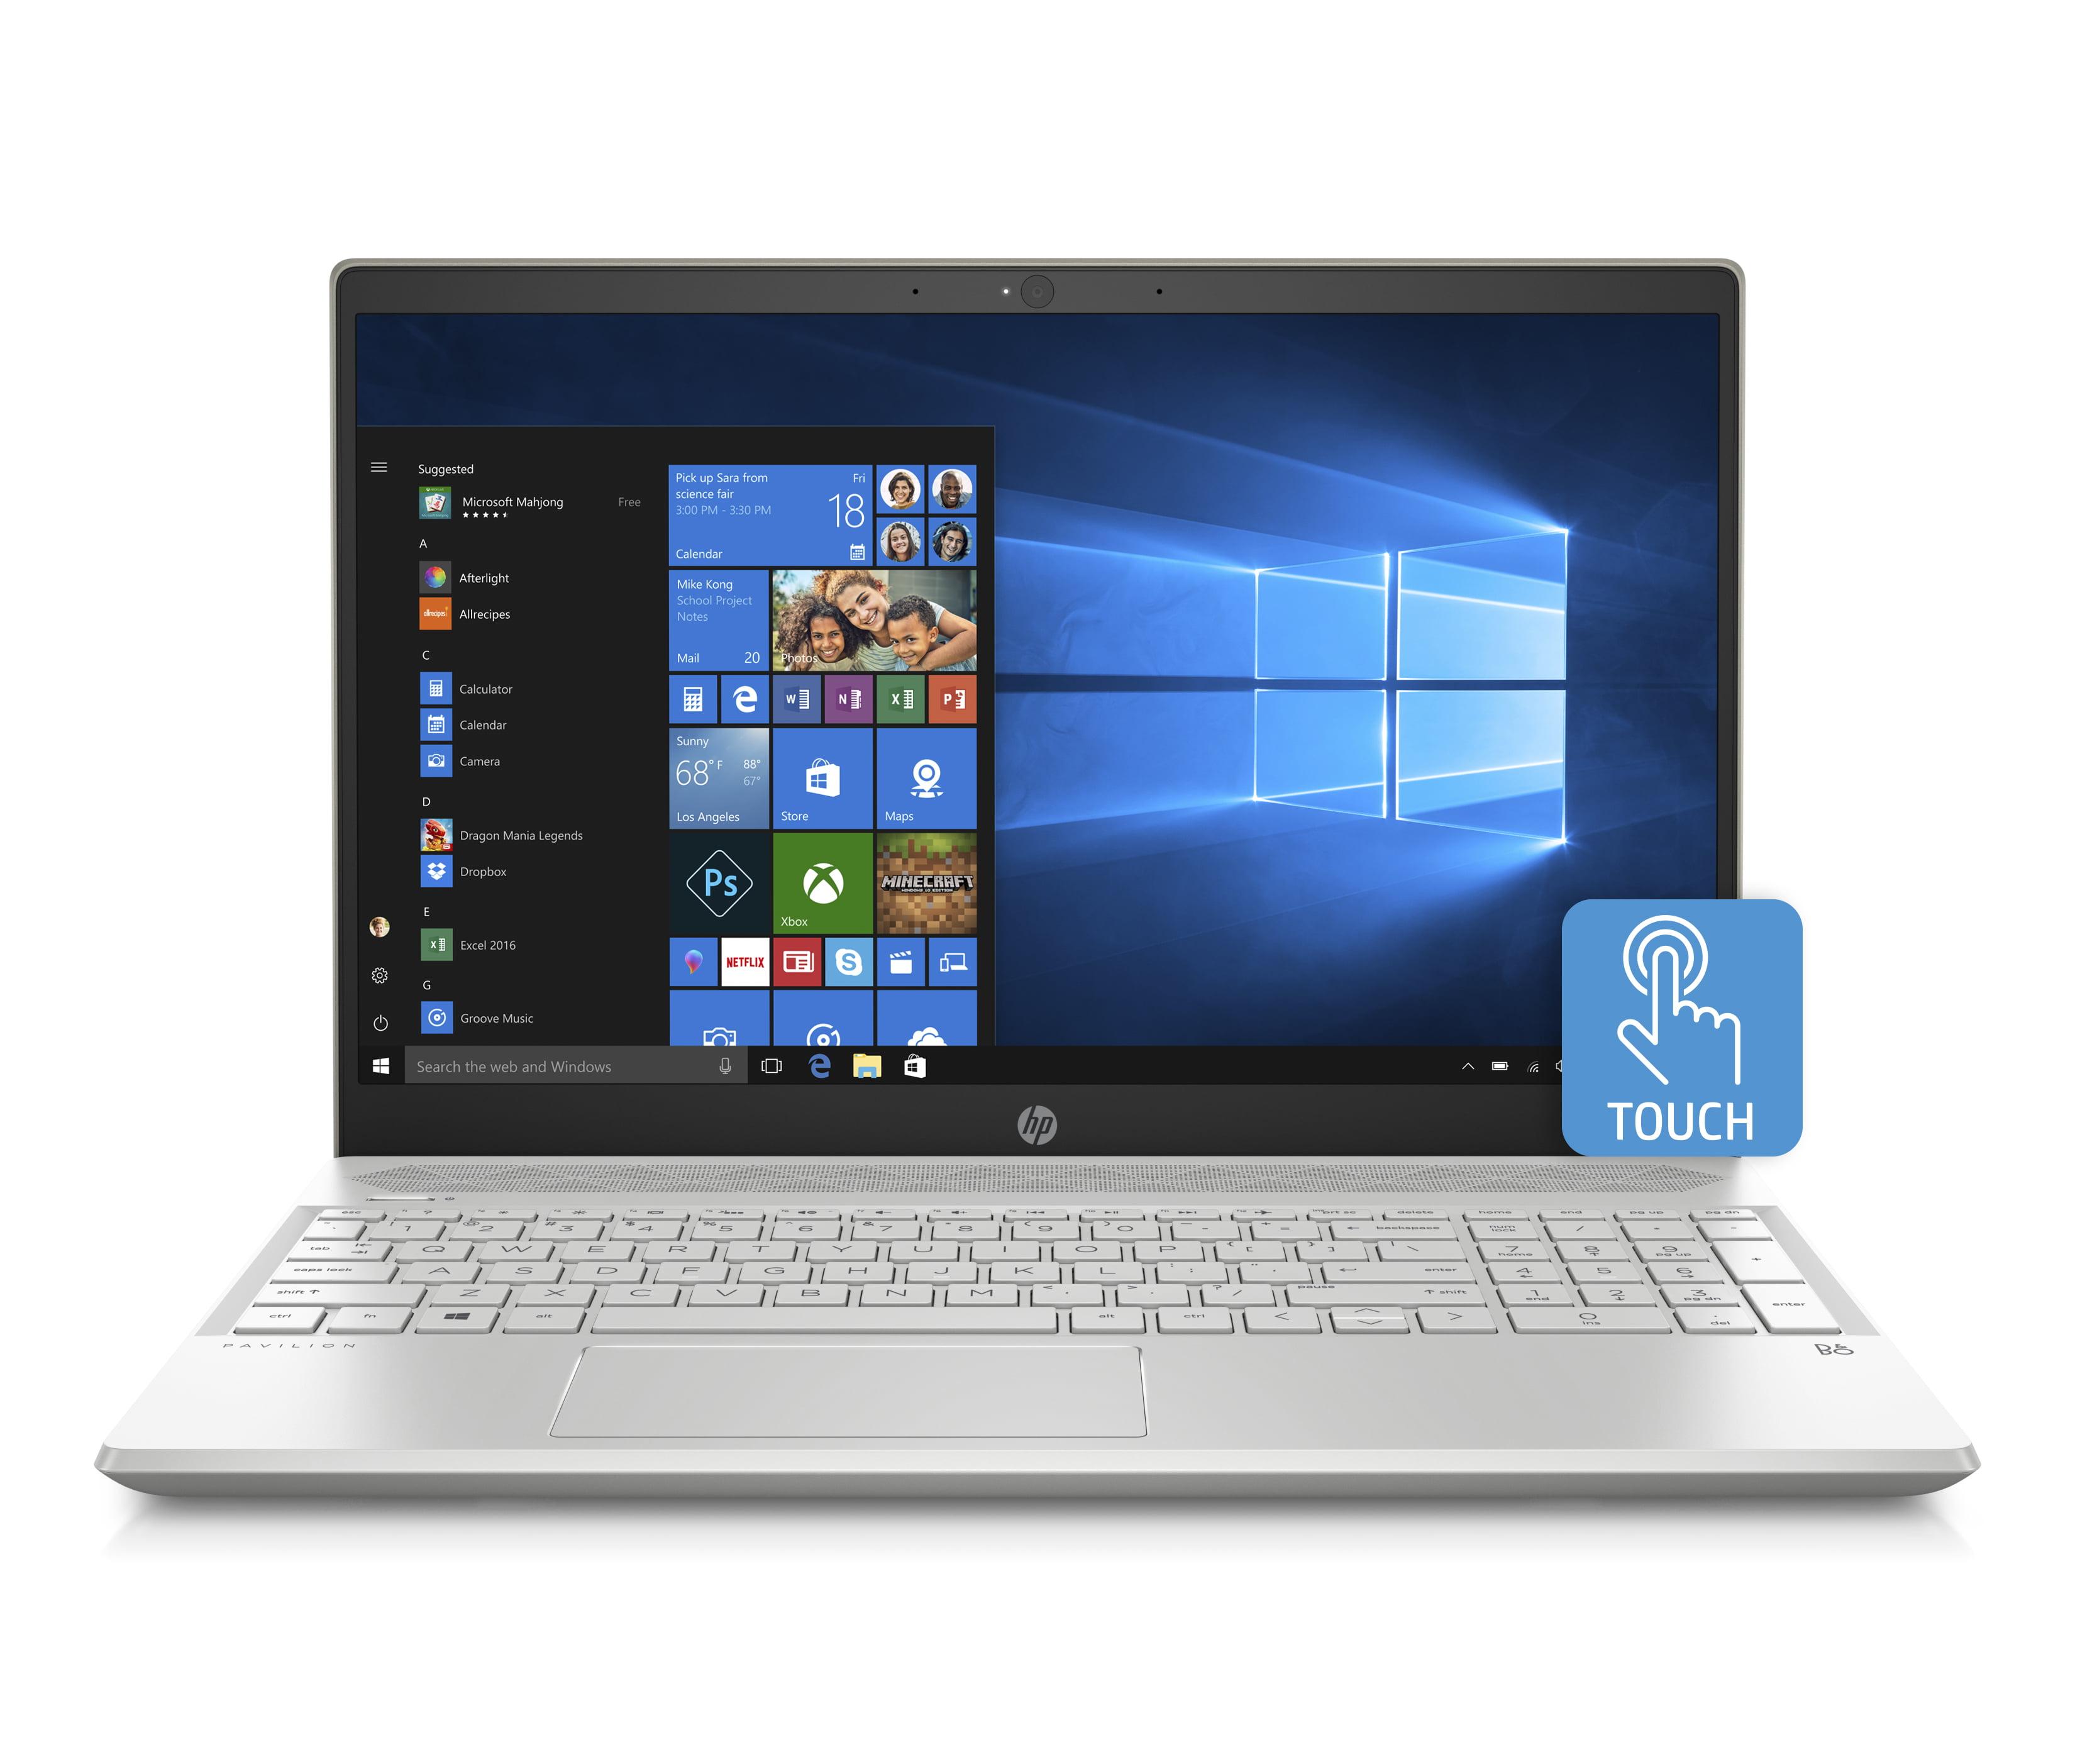 "HP Pavilion 15 Laptop 15.6"" Touchscreen, Intel Core i5-8250U, Intel UHD Graphics 620, 1TB HDD + 16GB... by HP"